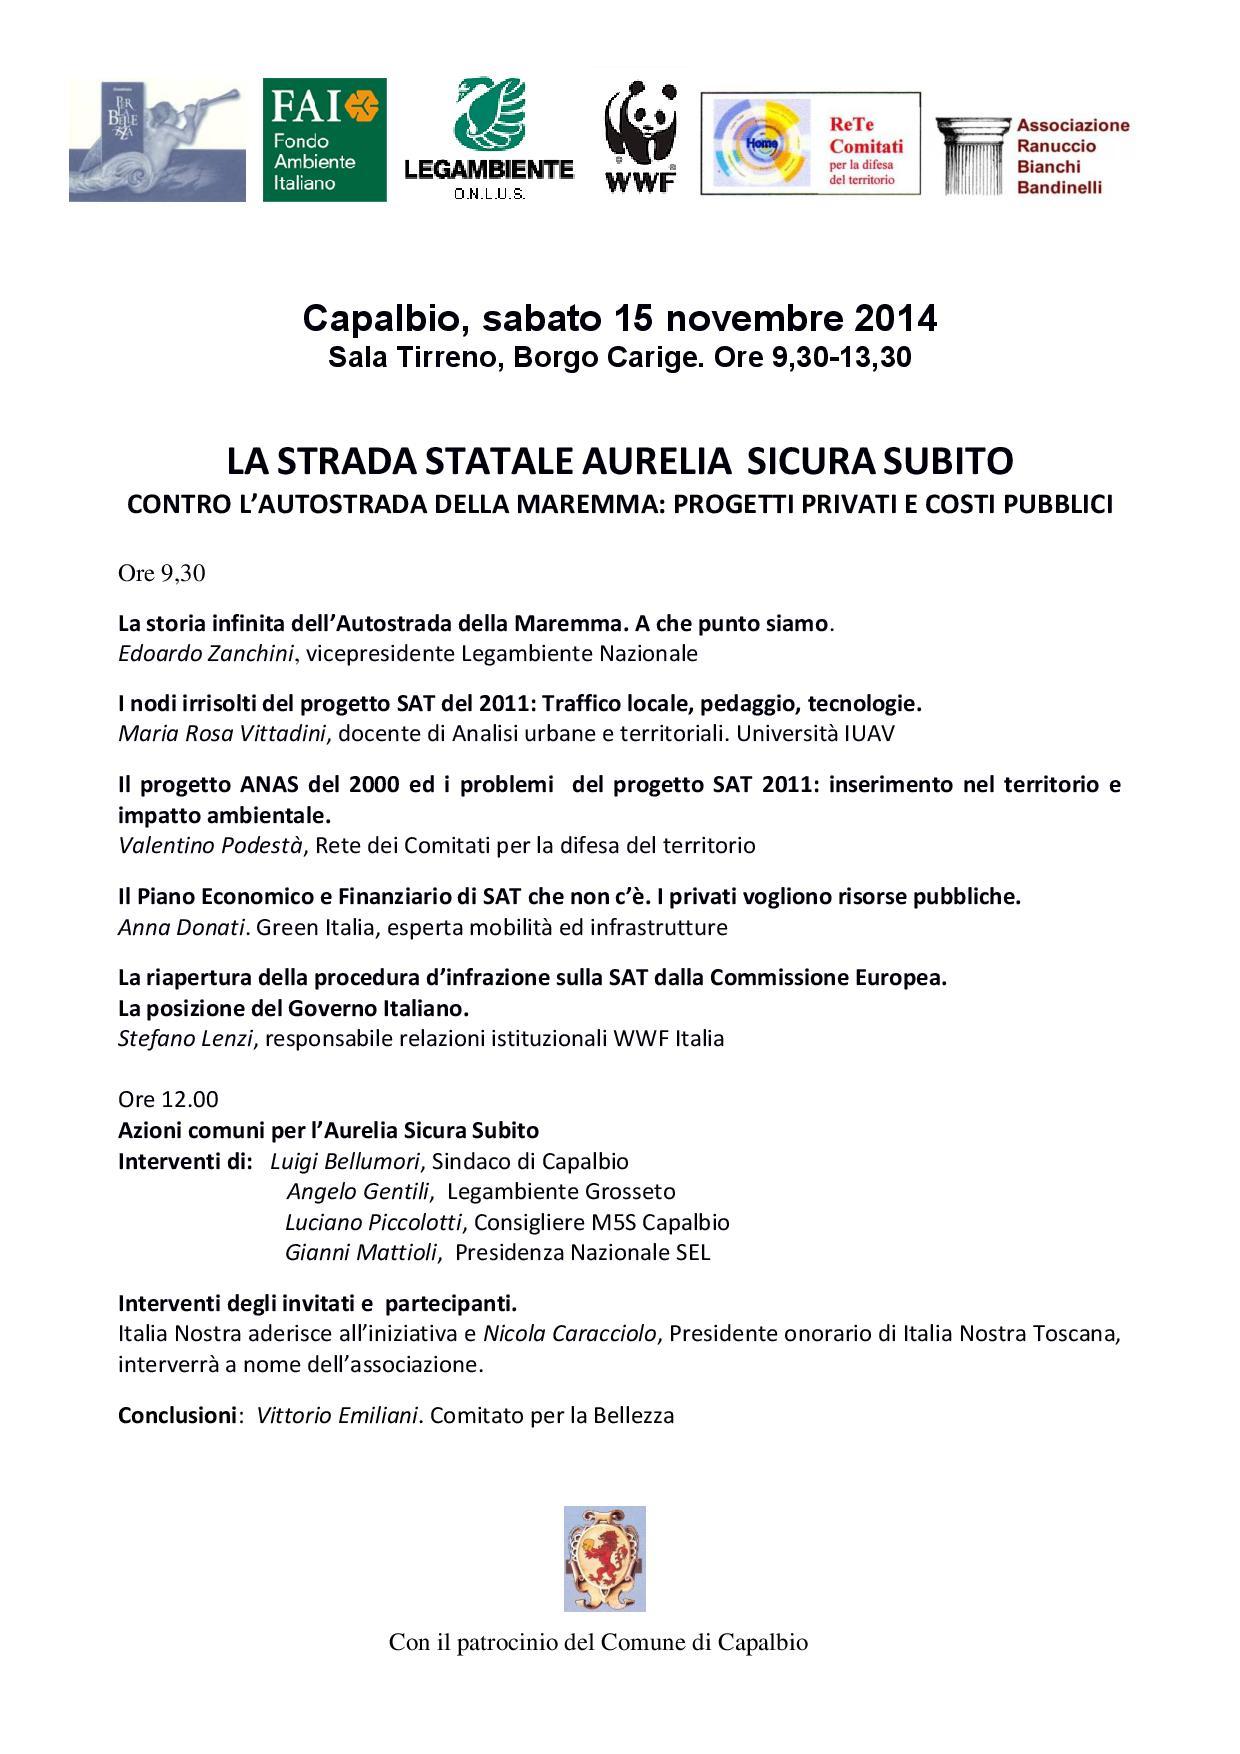 Programma Iniziativa Autostrada 15 nov 2014 Capalbio-page-001